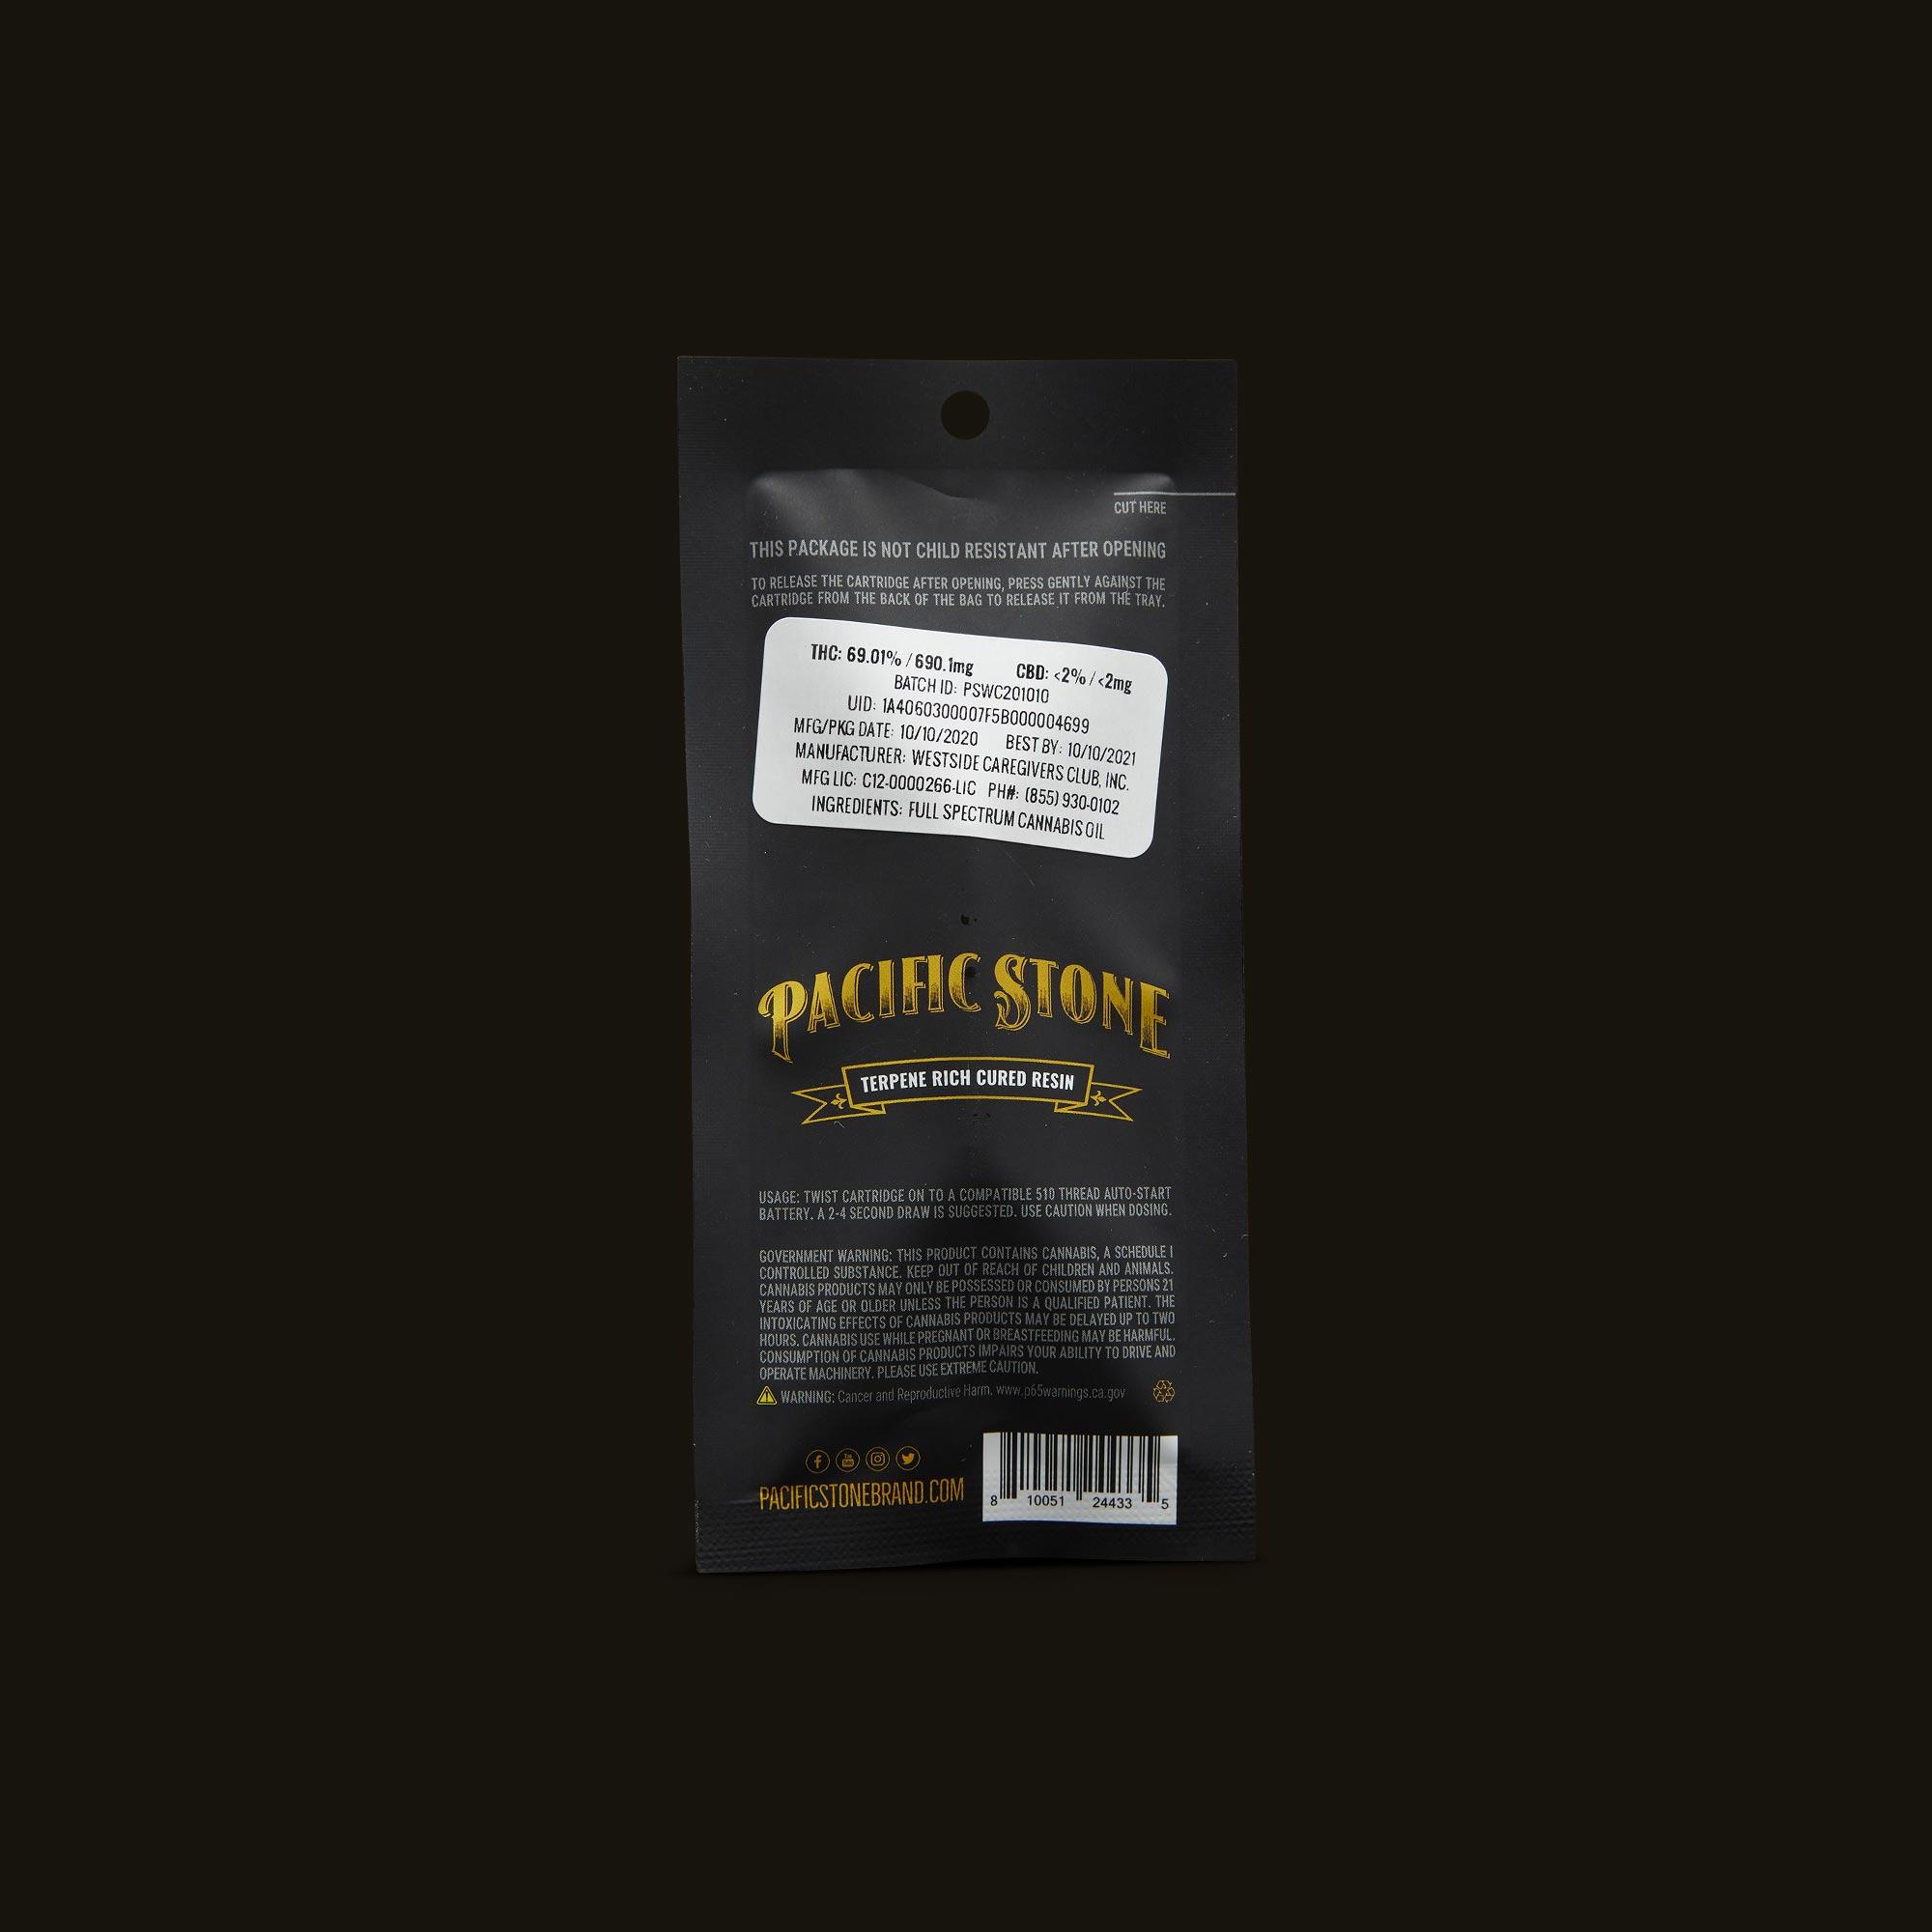 Pacific Stone Wedding Cake Sauce Cartridge Back Packaging